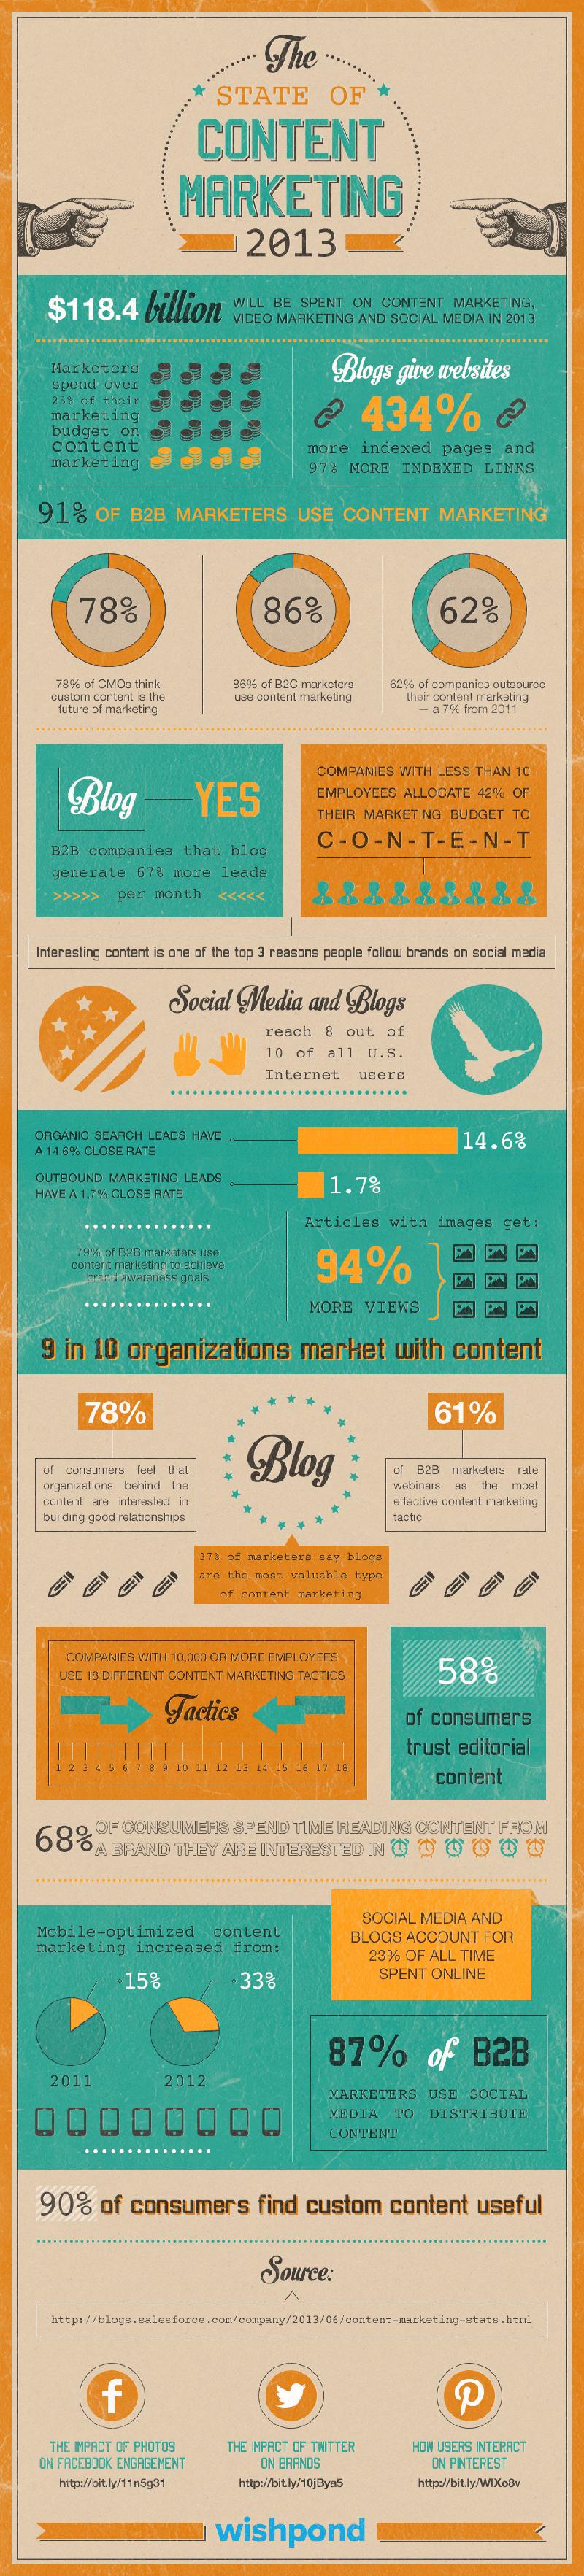 25 Astonishing Content Marketing Statistics and Trends